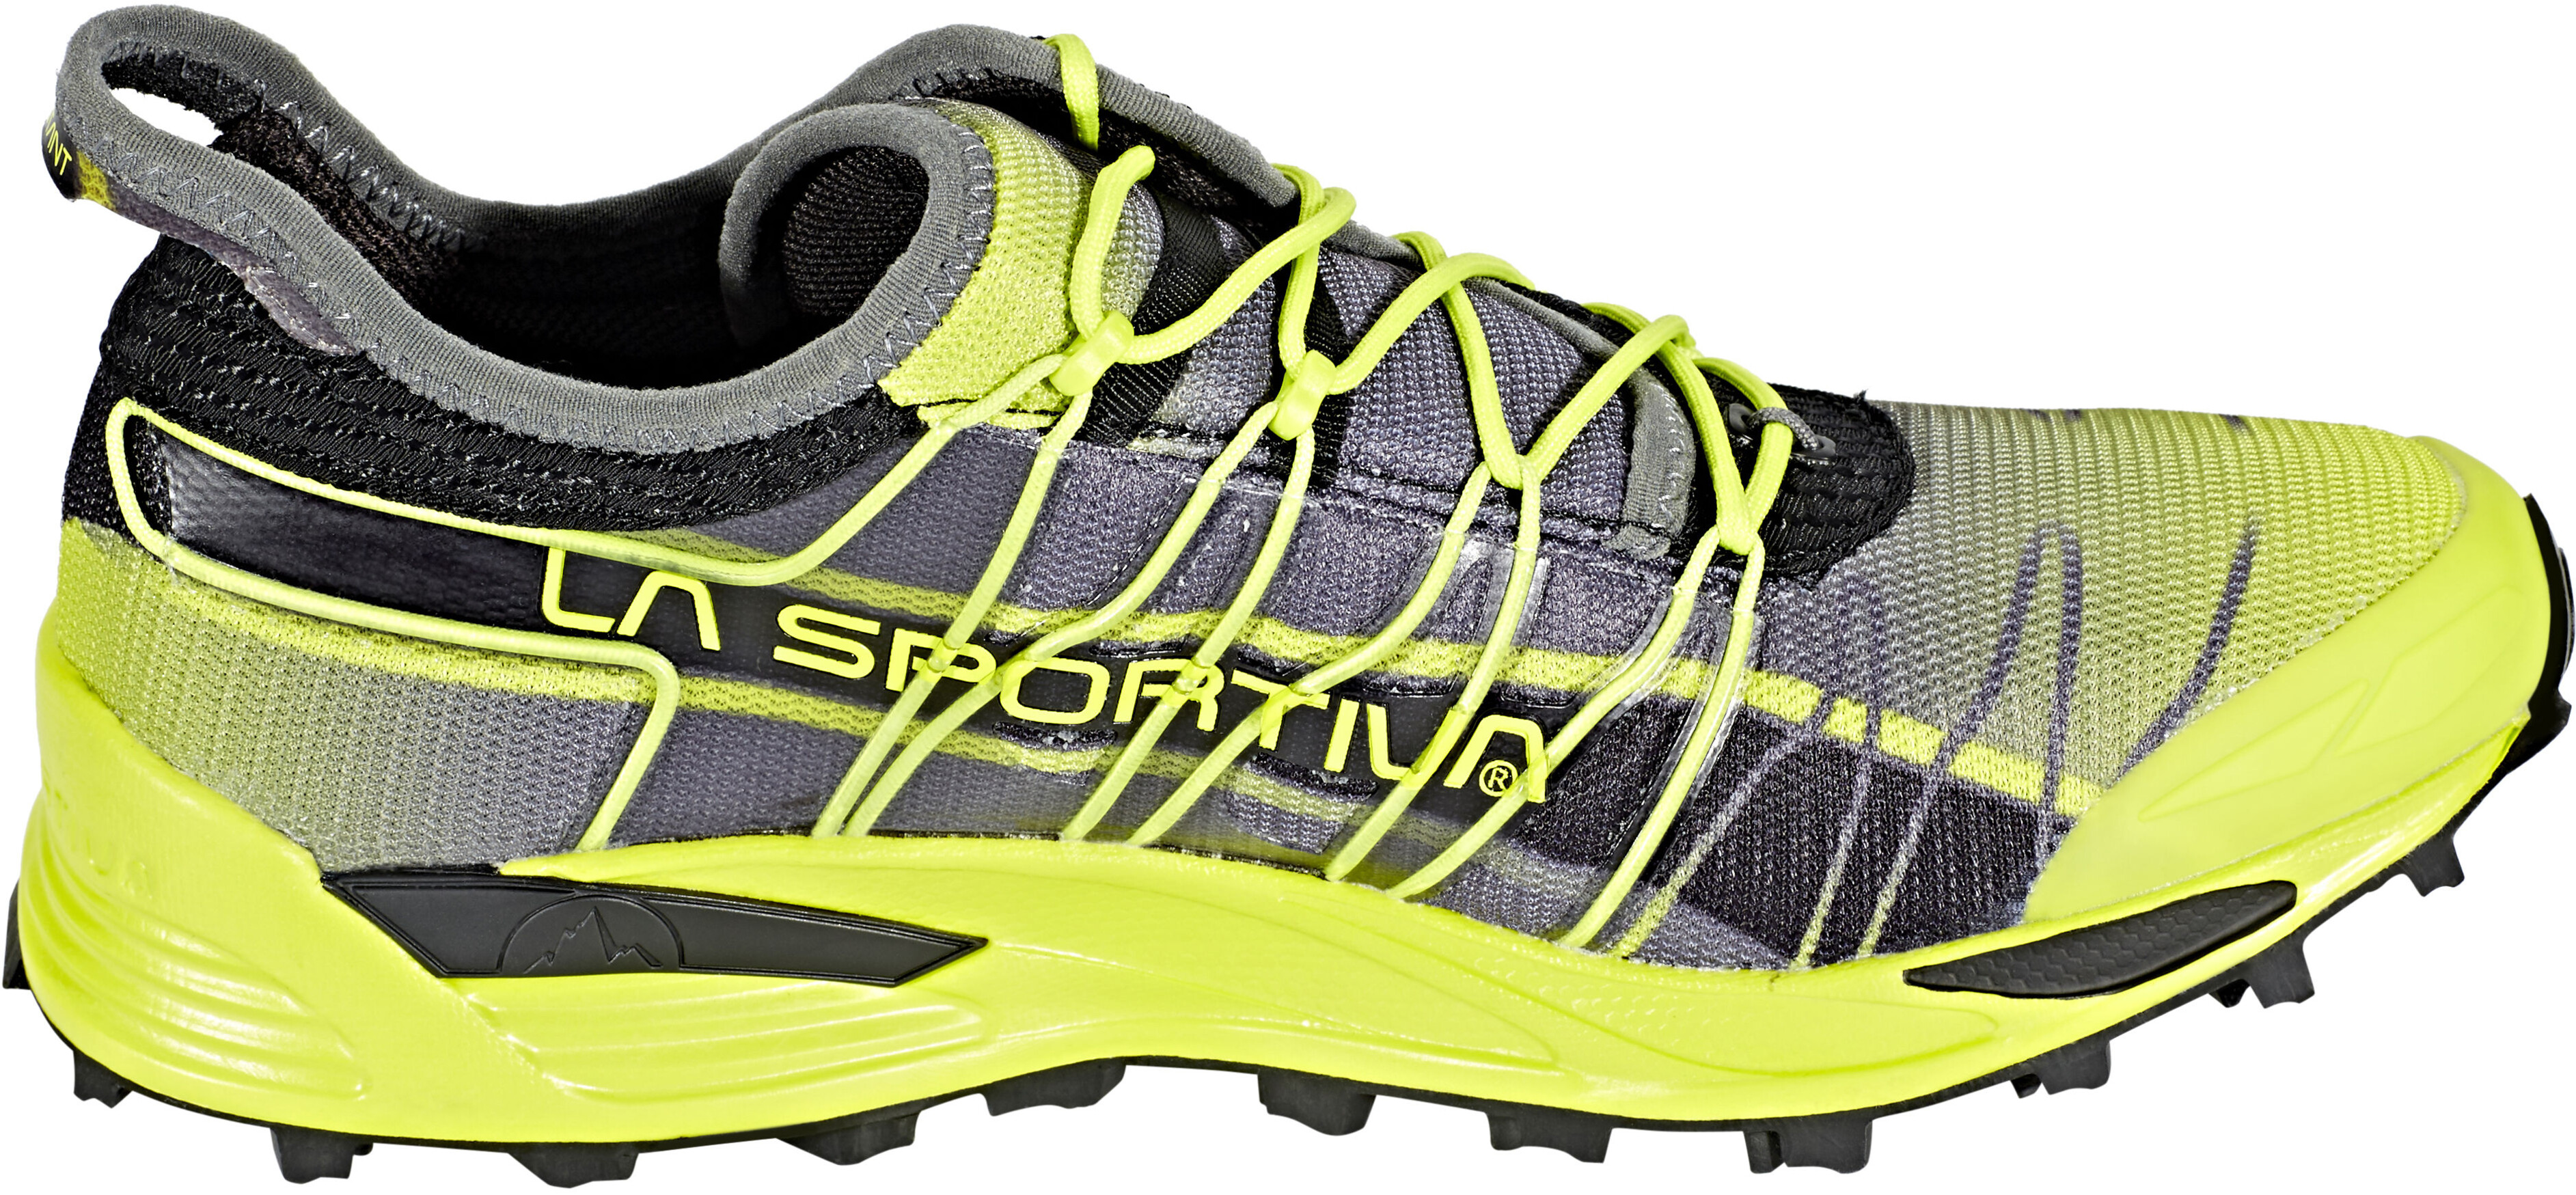 ed70cb904e6 La Sportiva Mutant Running Shoes Men yellow grey